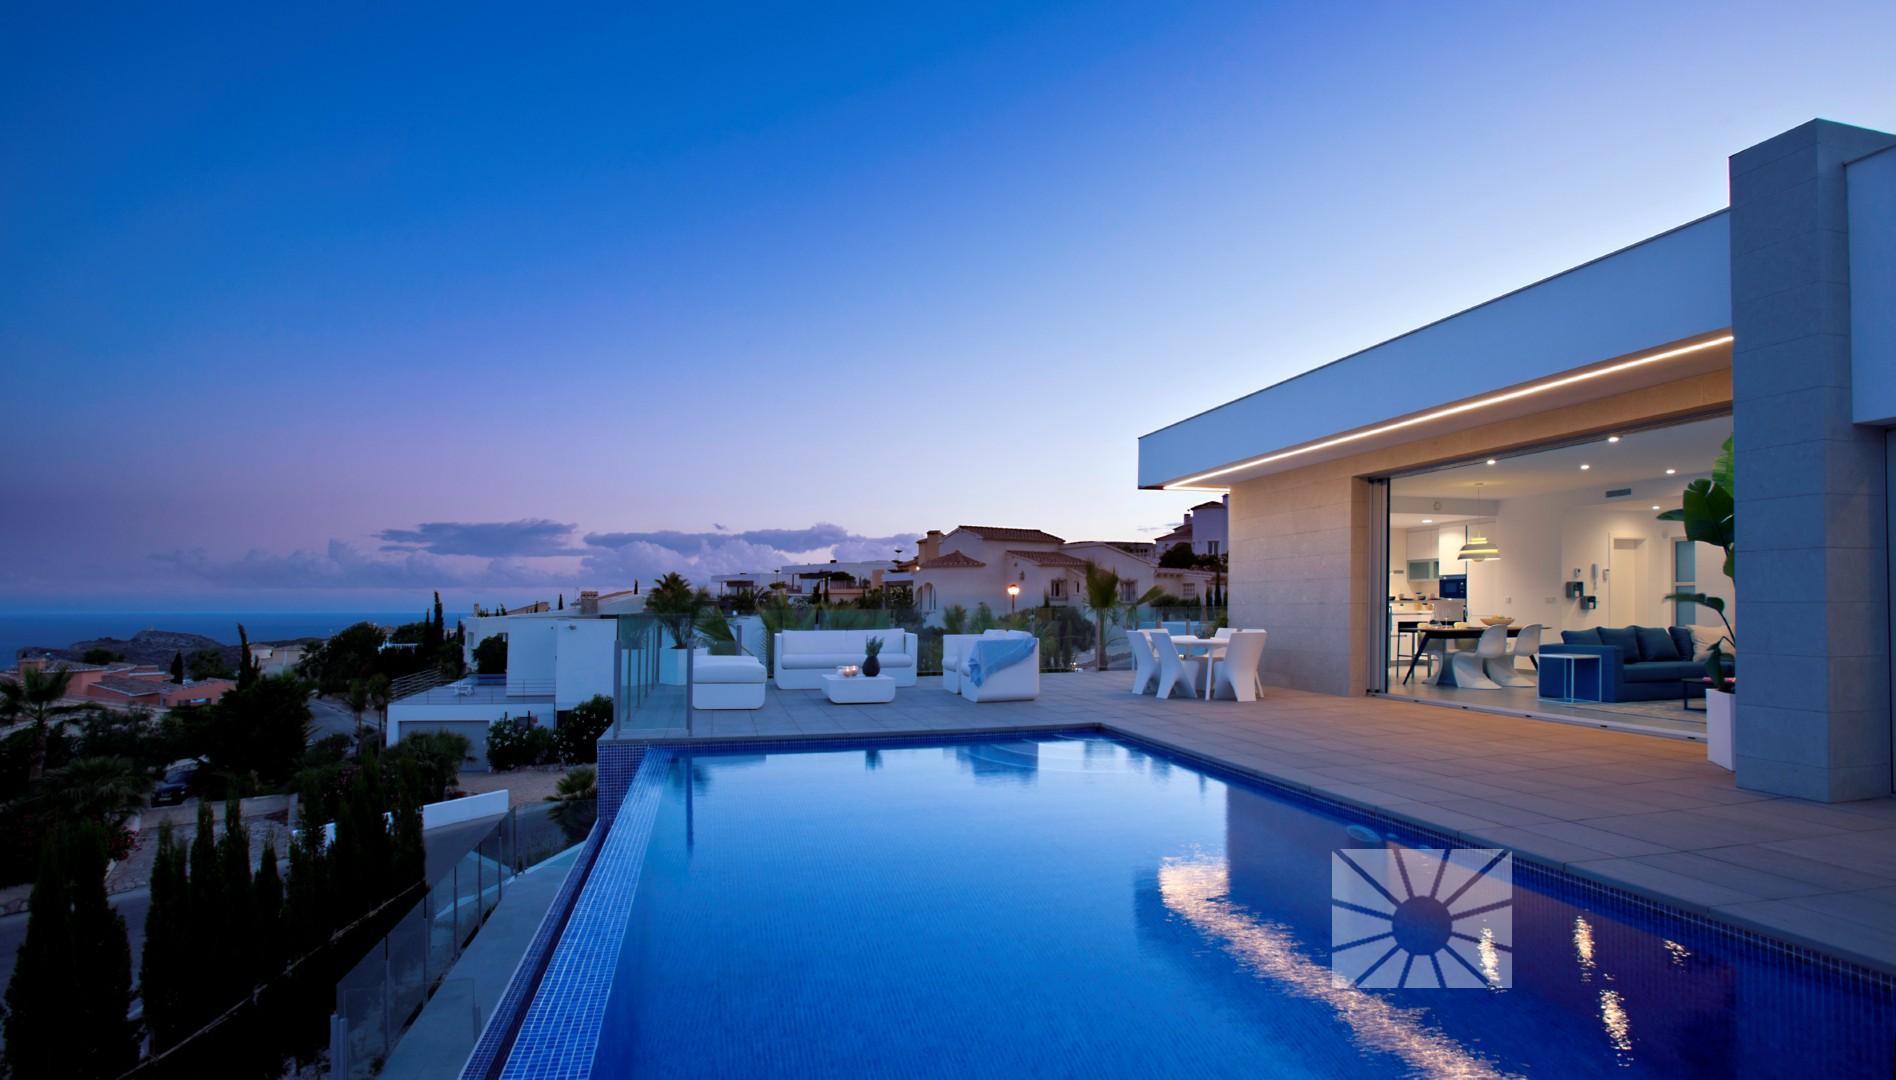 Idee Eclairage Terrasse Piscine lirios design cumbre del sol villa moderne à vendre ref